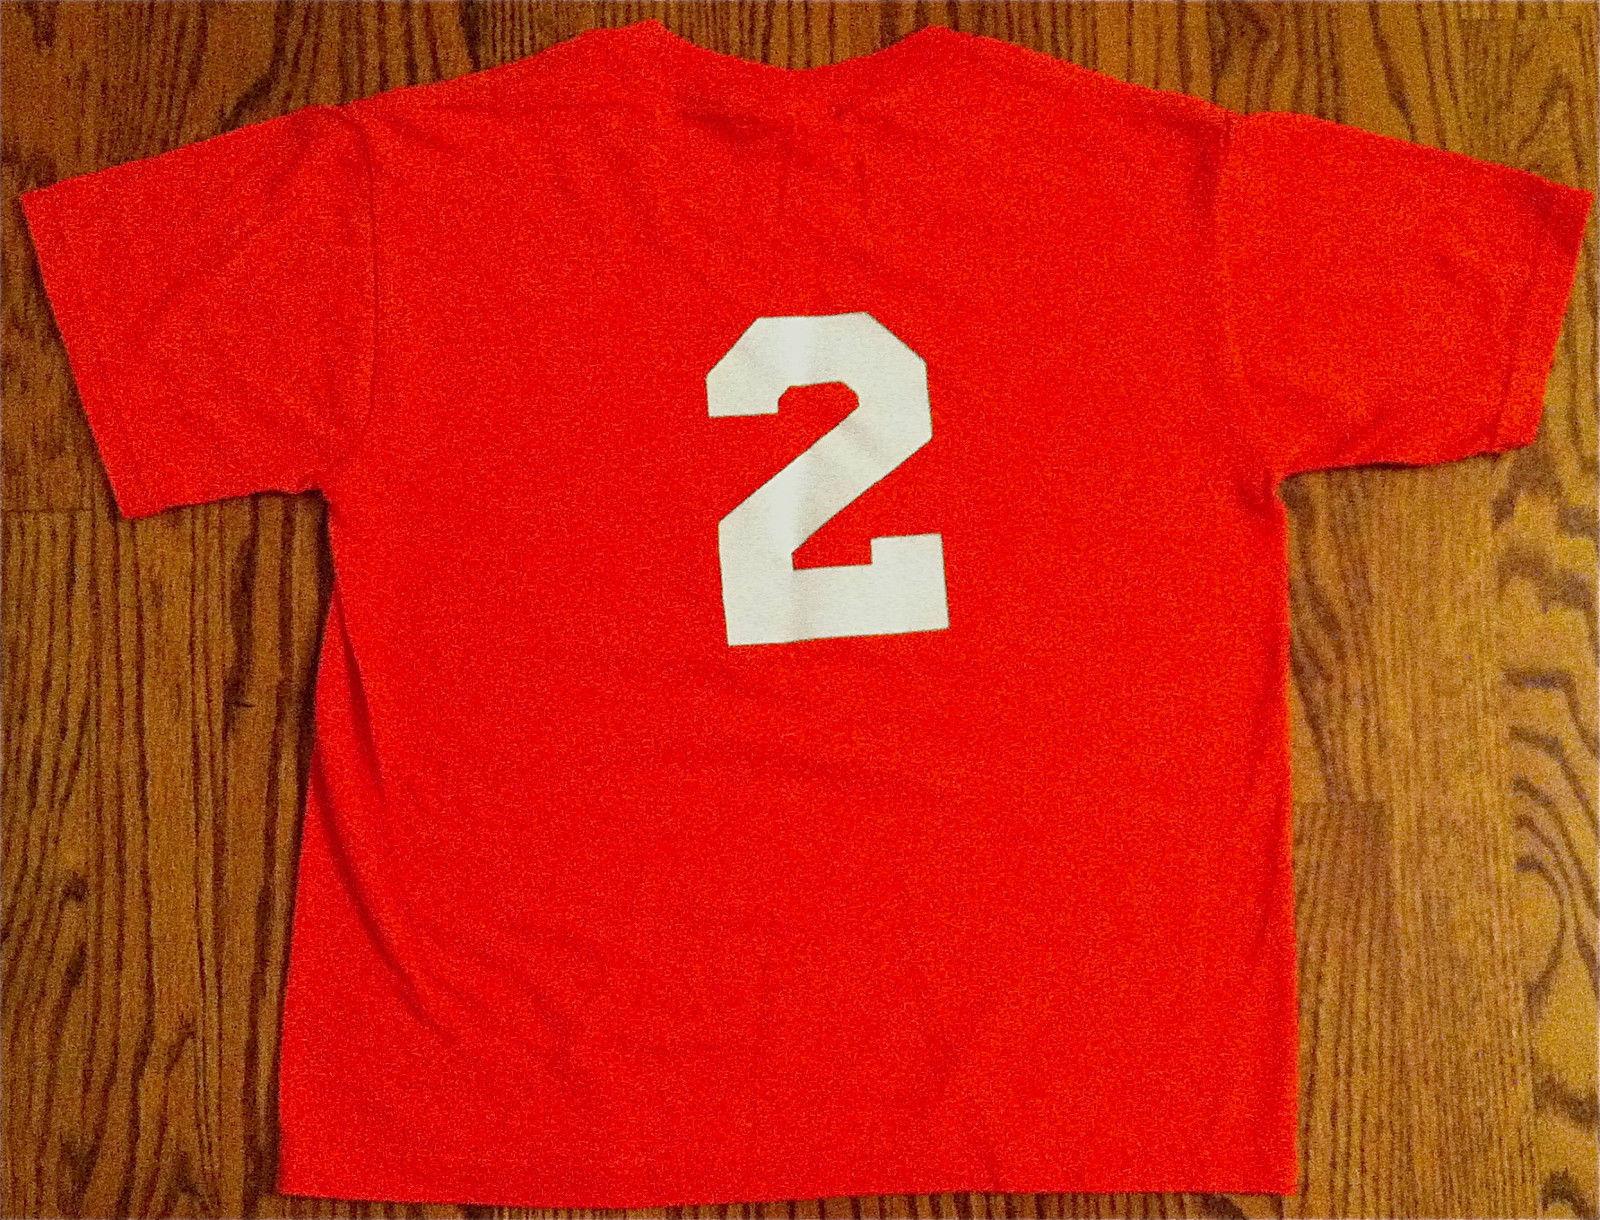 "NEW JERZEES BOYS ORANGE T-SHIRT SZ M 10-12 ""W. JENNINGS CO"" ON FRONT ""2"" ON BACK image 2"